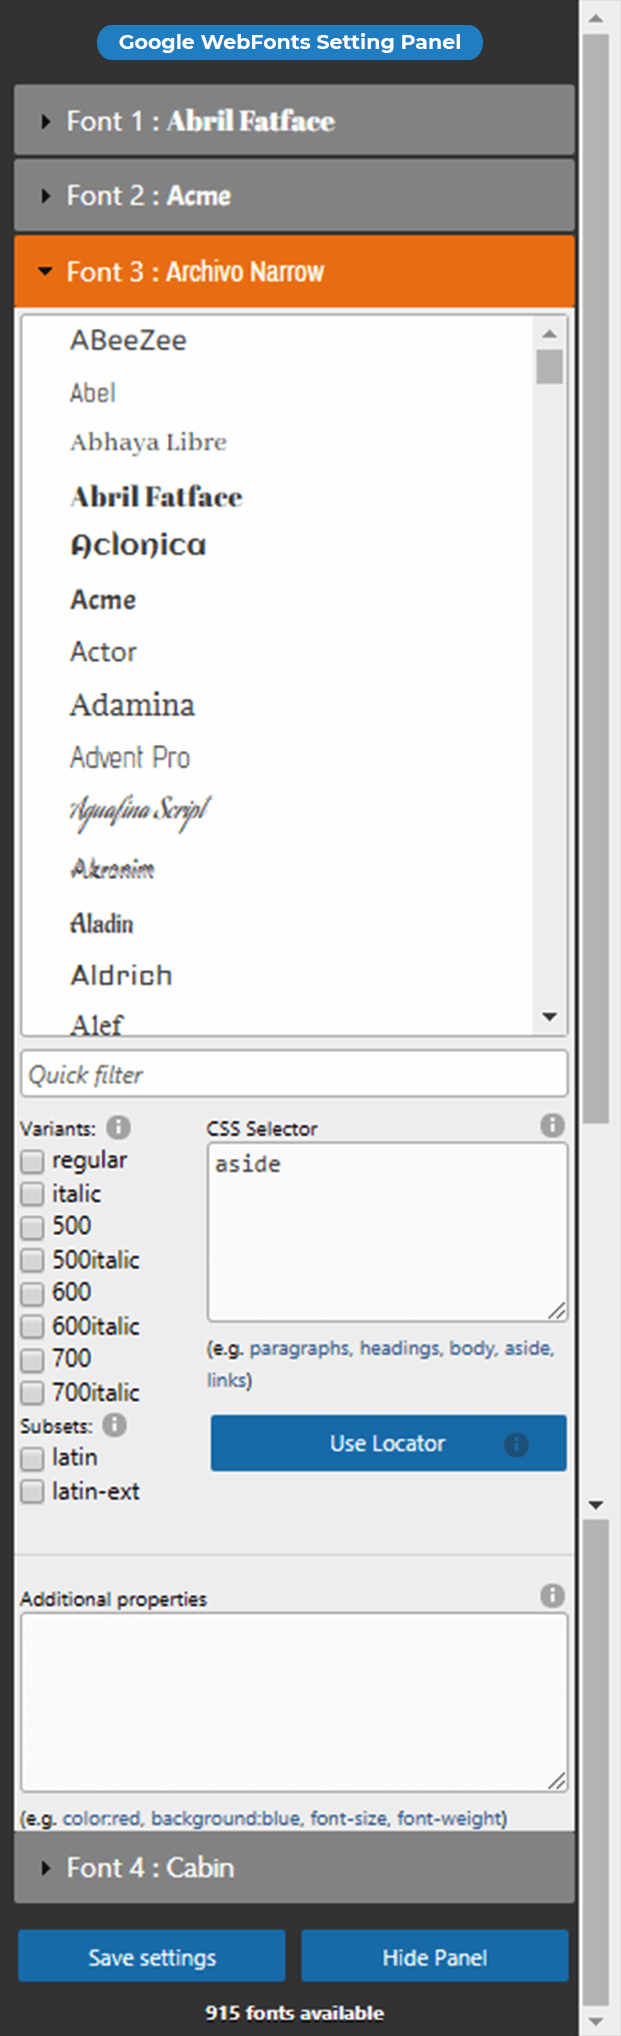 Ultimate Google Fonts Plugin - Google Fonts Setting Panel